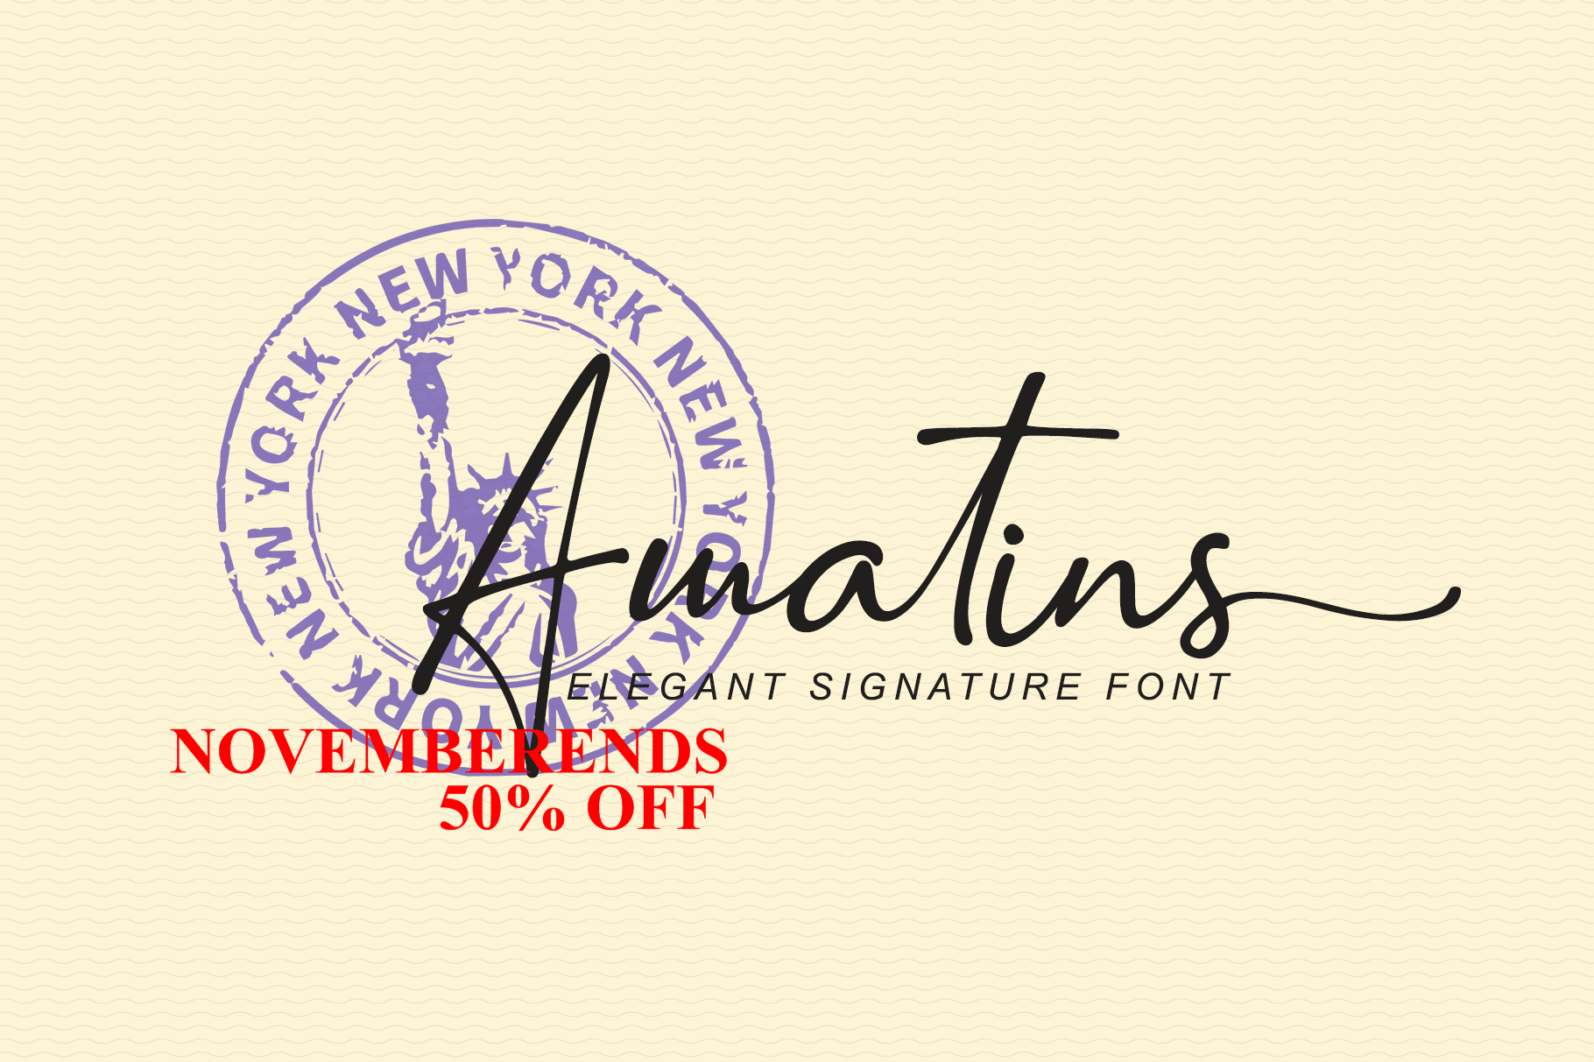 Amatins - Amatins 1 50OFF -